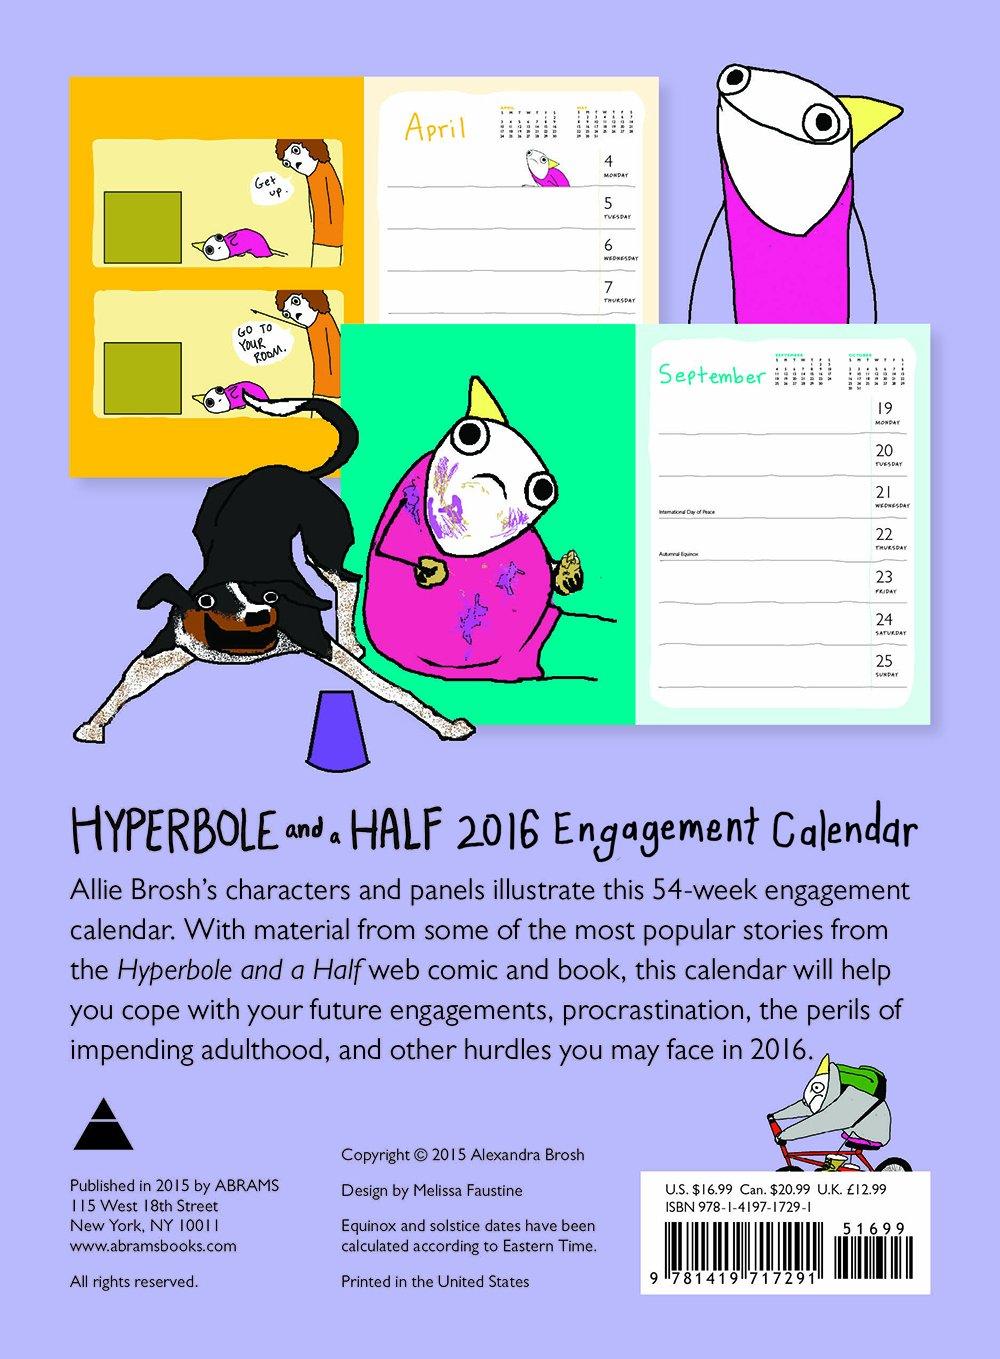 Hyperbole and a Half 2016 Engagement Calendar: Allie Brosh: 9781419717291:  Amazon.com: Books